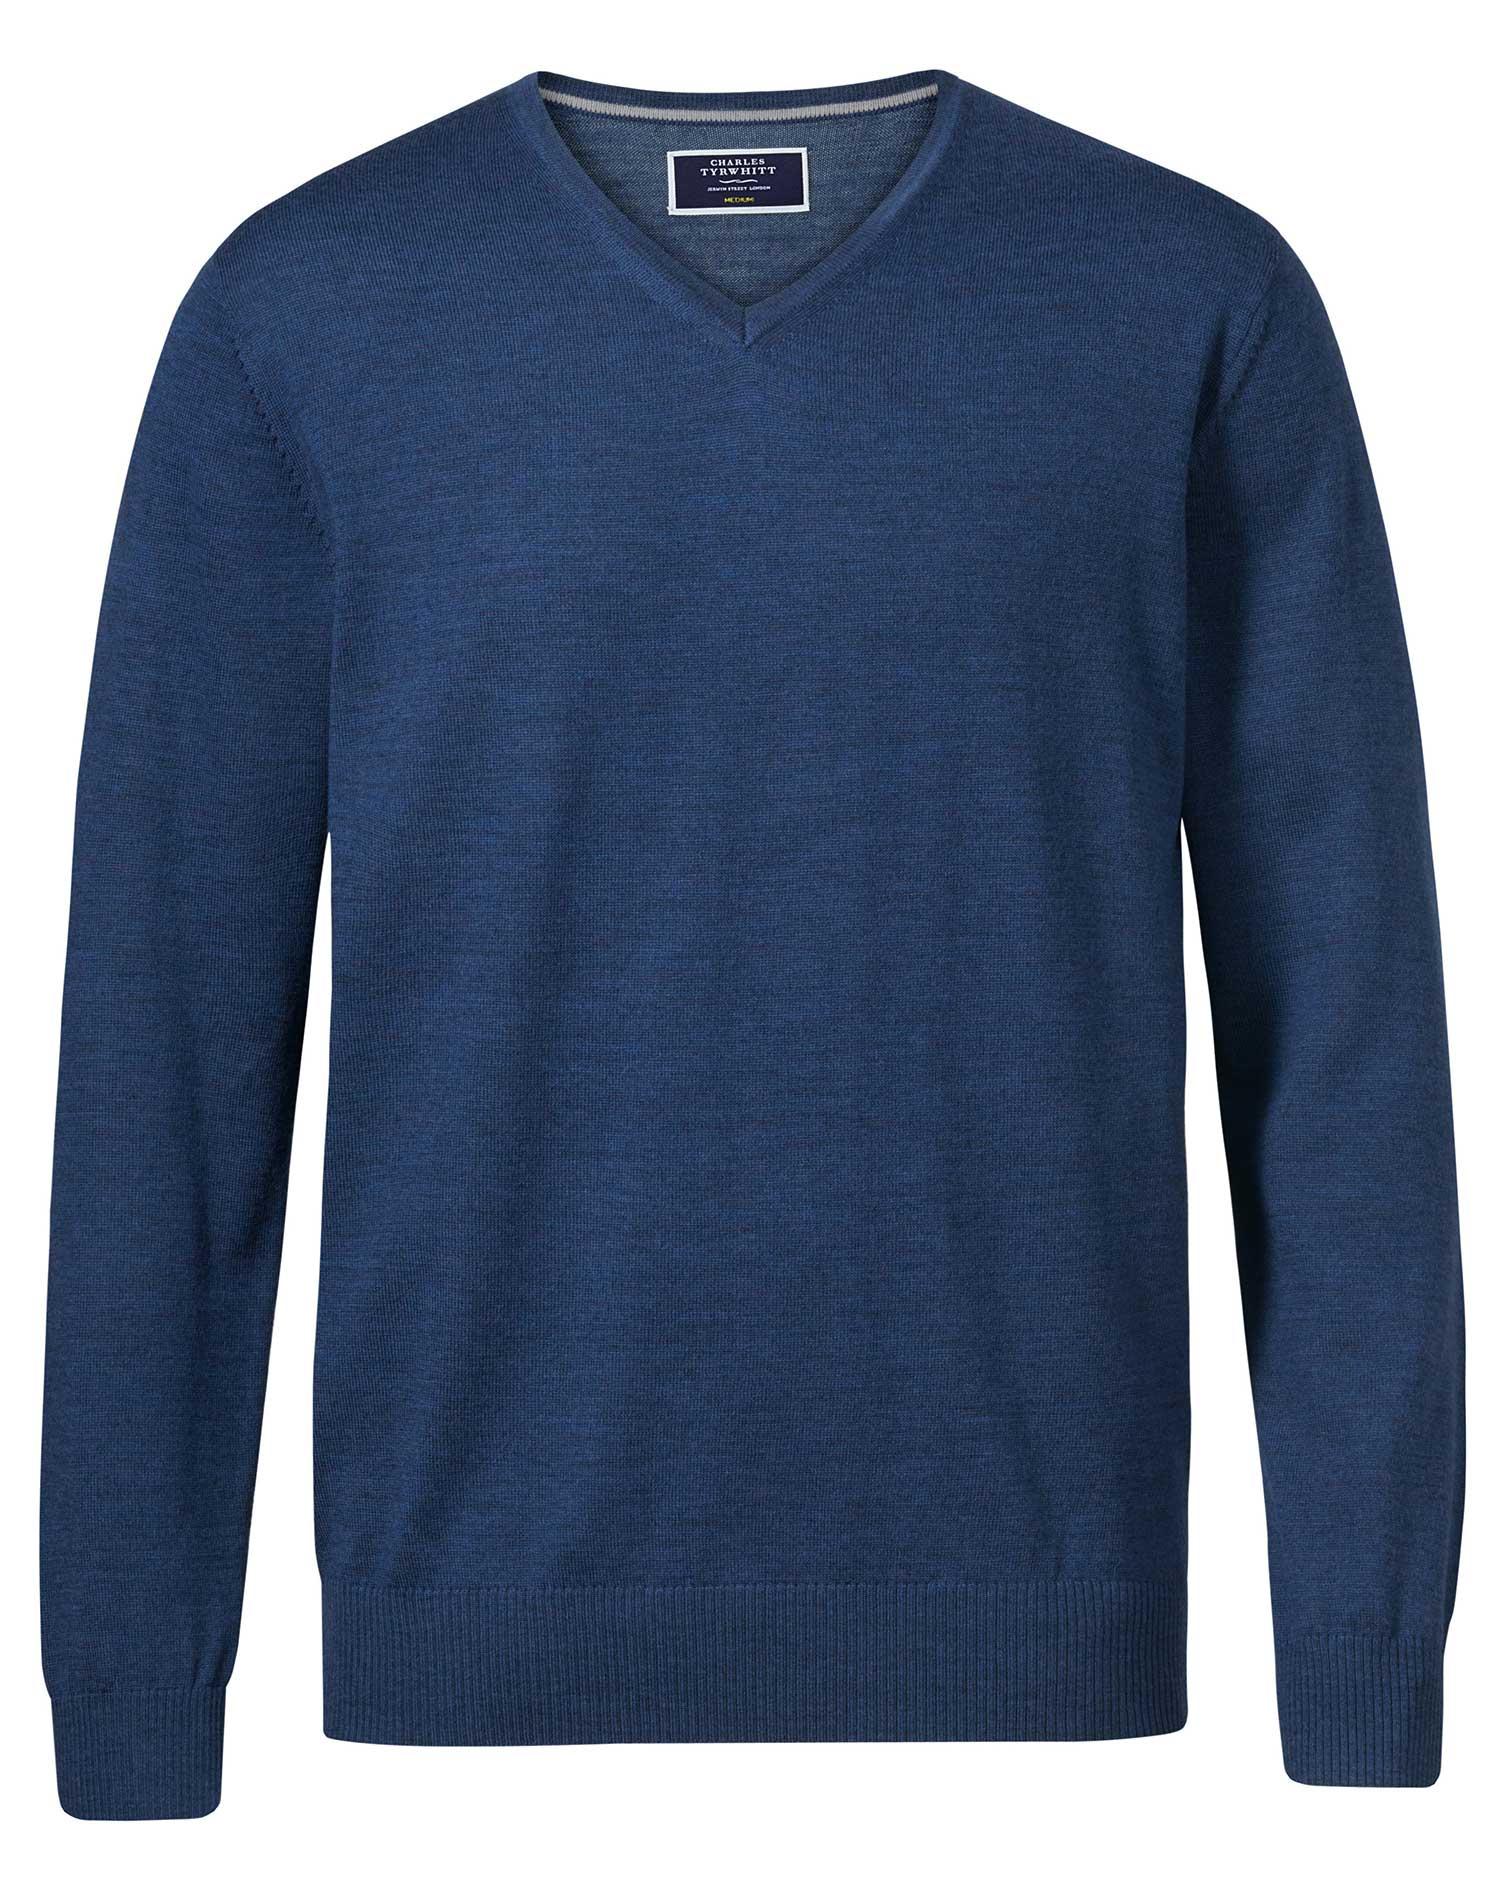 Mid Blue Merino Wool V-Neck Jumper Size XXL by Charles Tyrwhitt